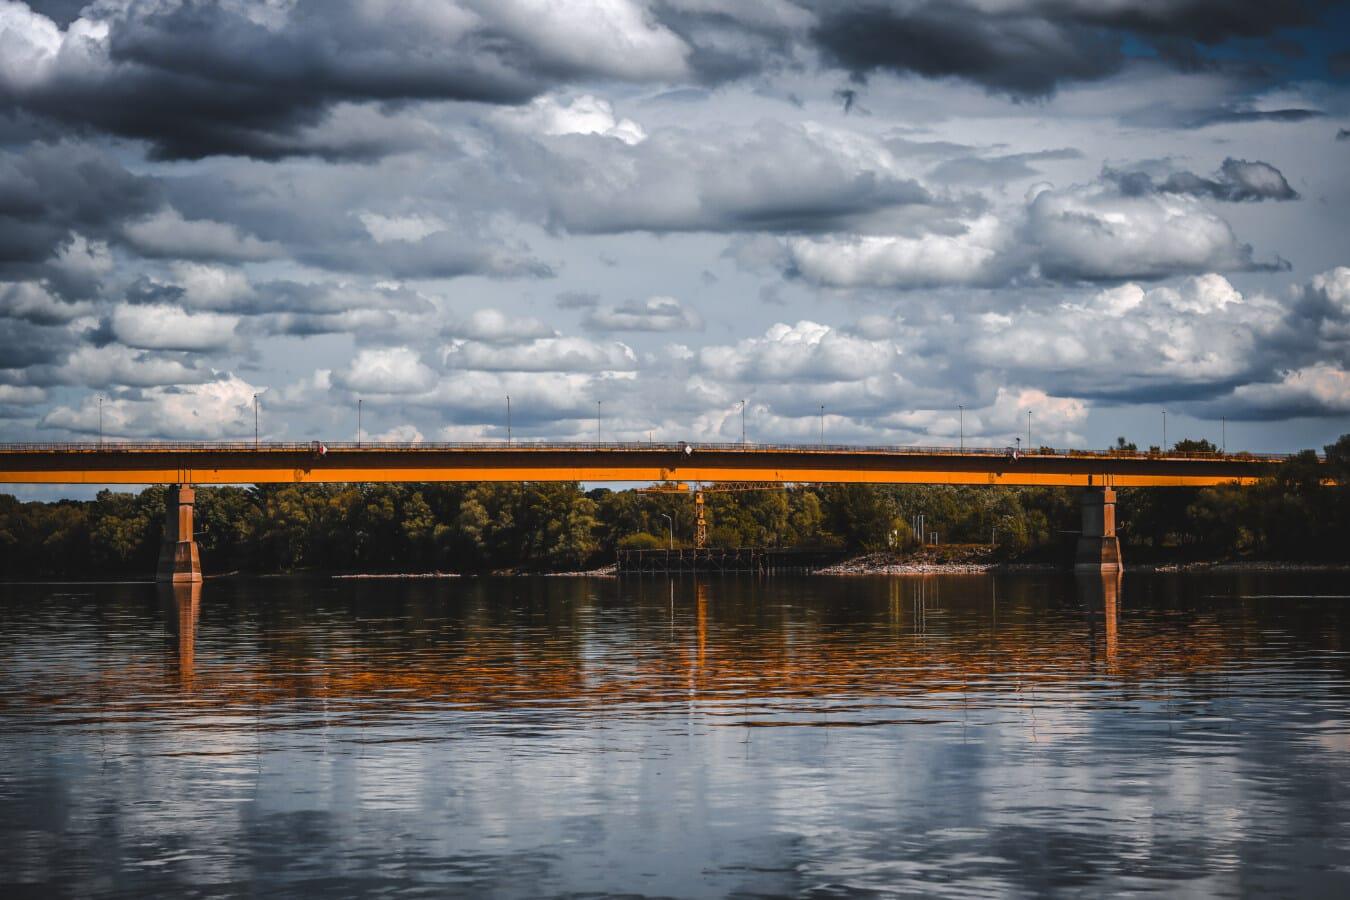 bridge, river, bad weather, storm, clouds, reflection, water, sunset, dawn, lake